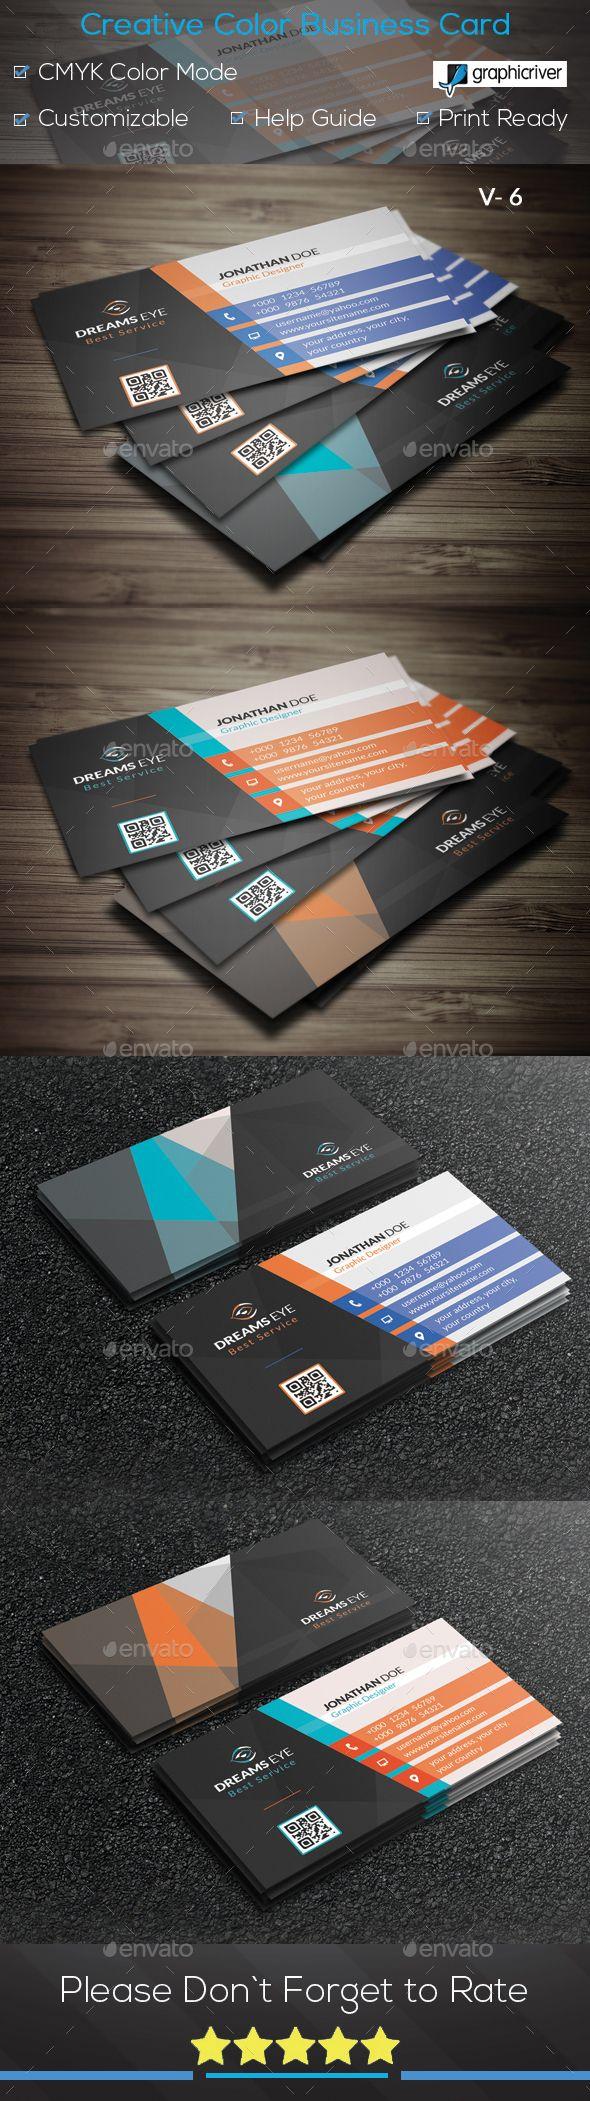 Creative color business card v6 creative business cards download creative color business card v6 creative business cards download here httpsgraphicriveritemcreative color business card v619251351ref reheart Choice Image